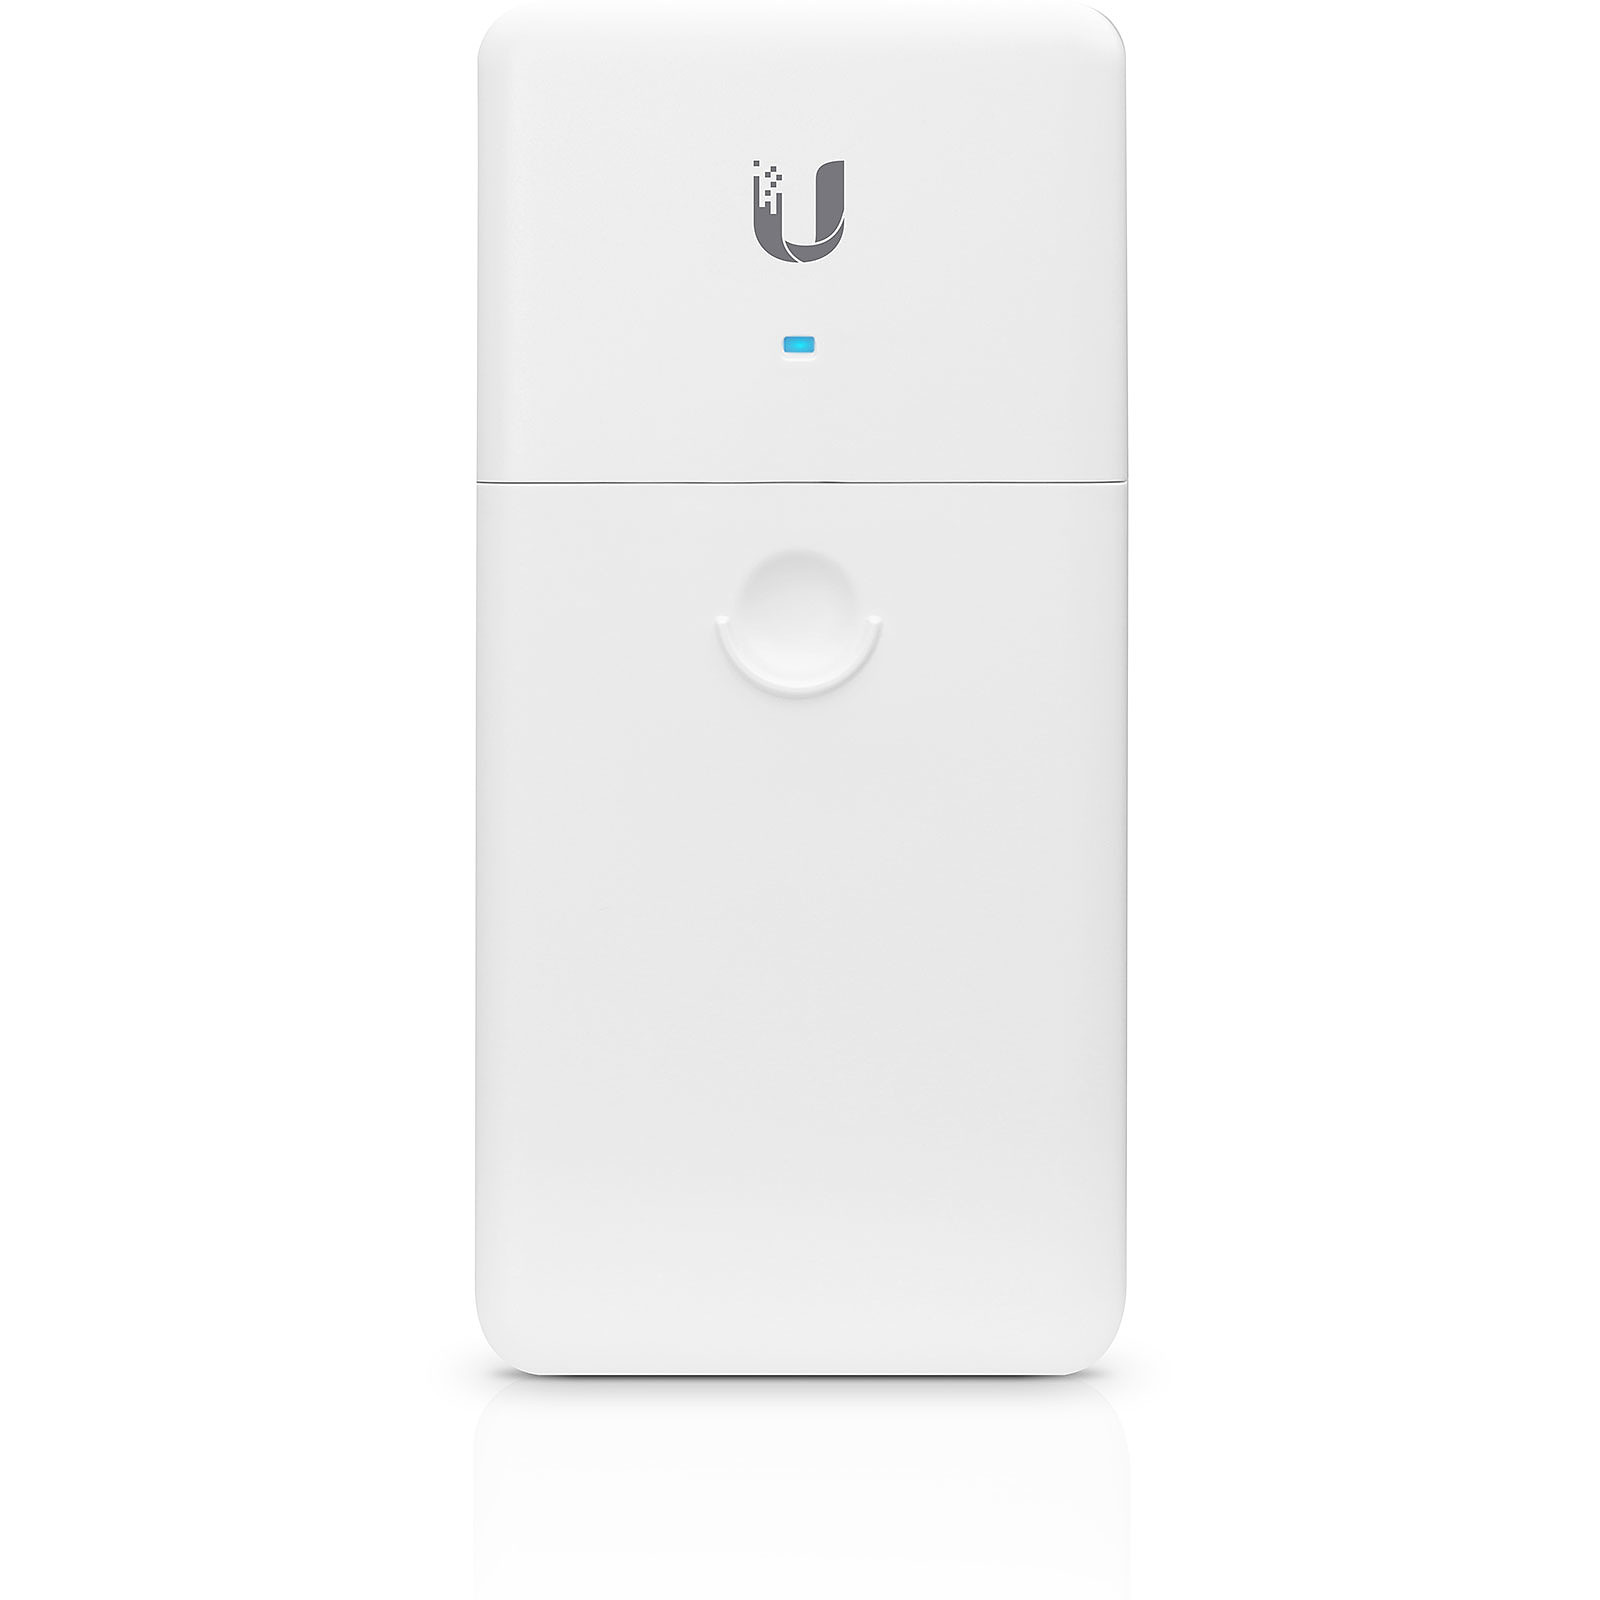 Ubiquiti NanoSwitch Outdoor 4 ports (UBN-N-SW)